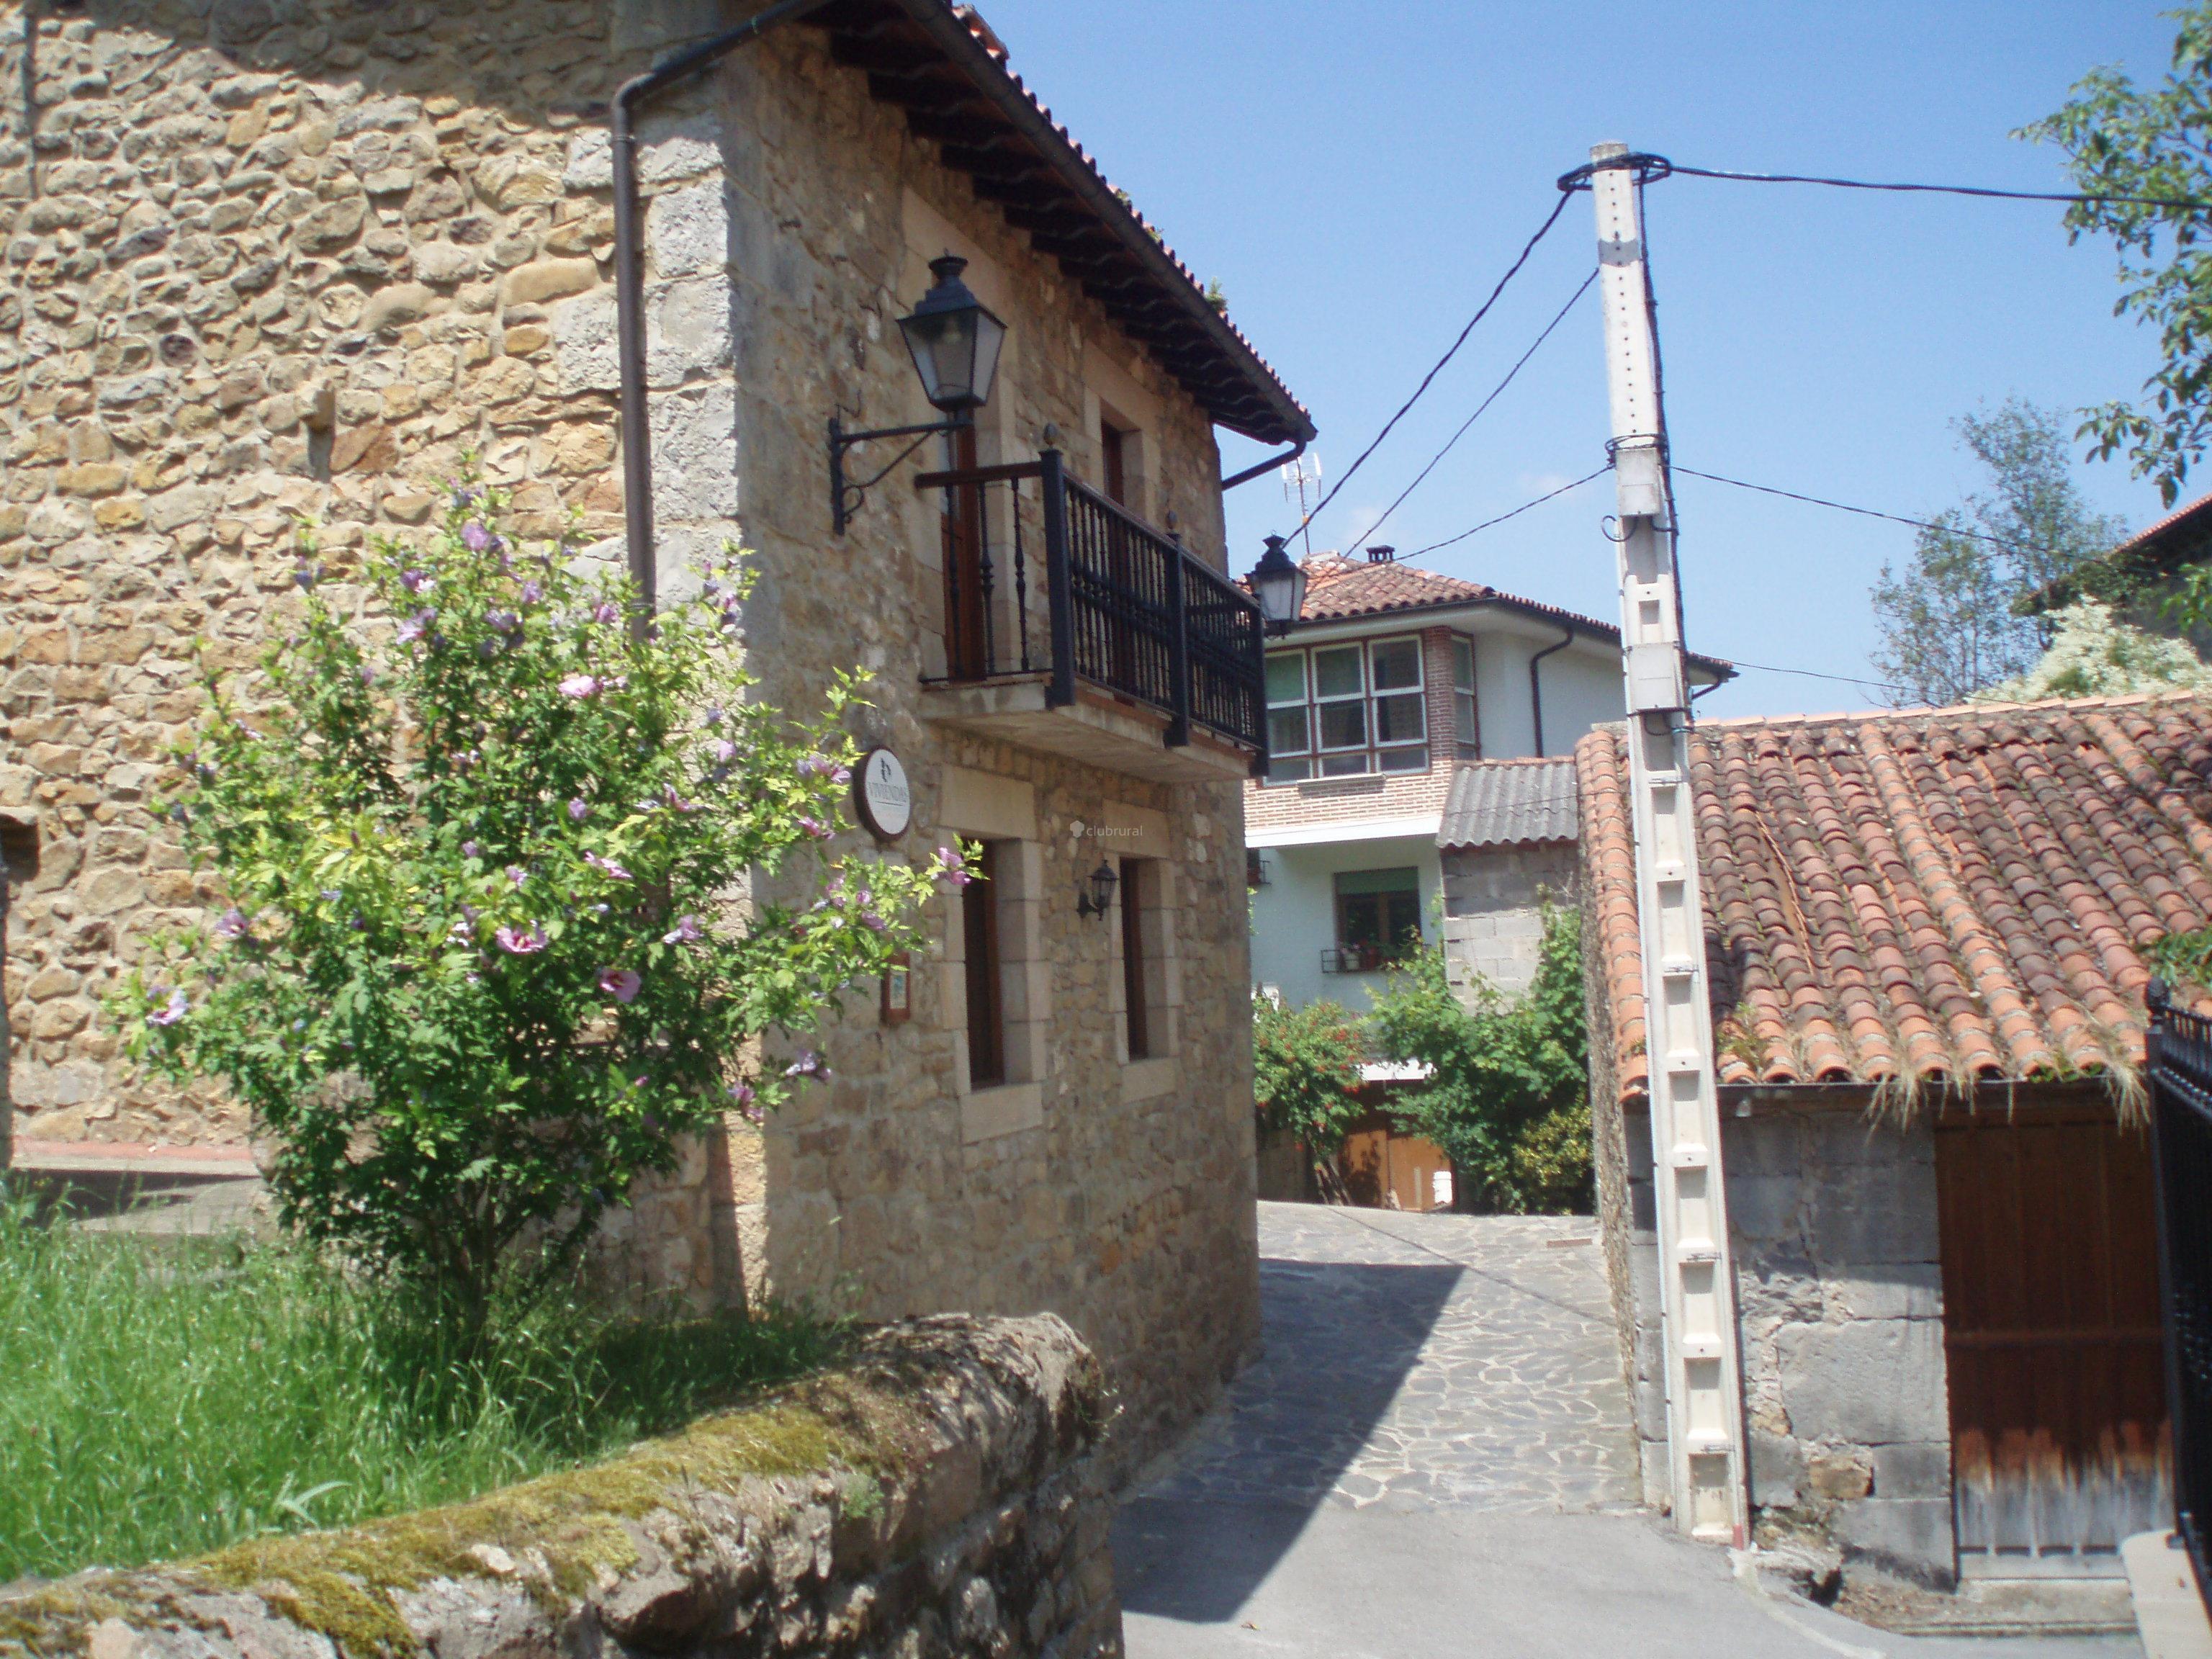 Fotos de la casa vieja cantabria corvera de toranzo - La casa vieja del abuelo ...